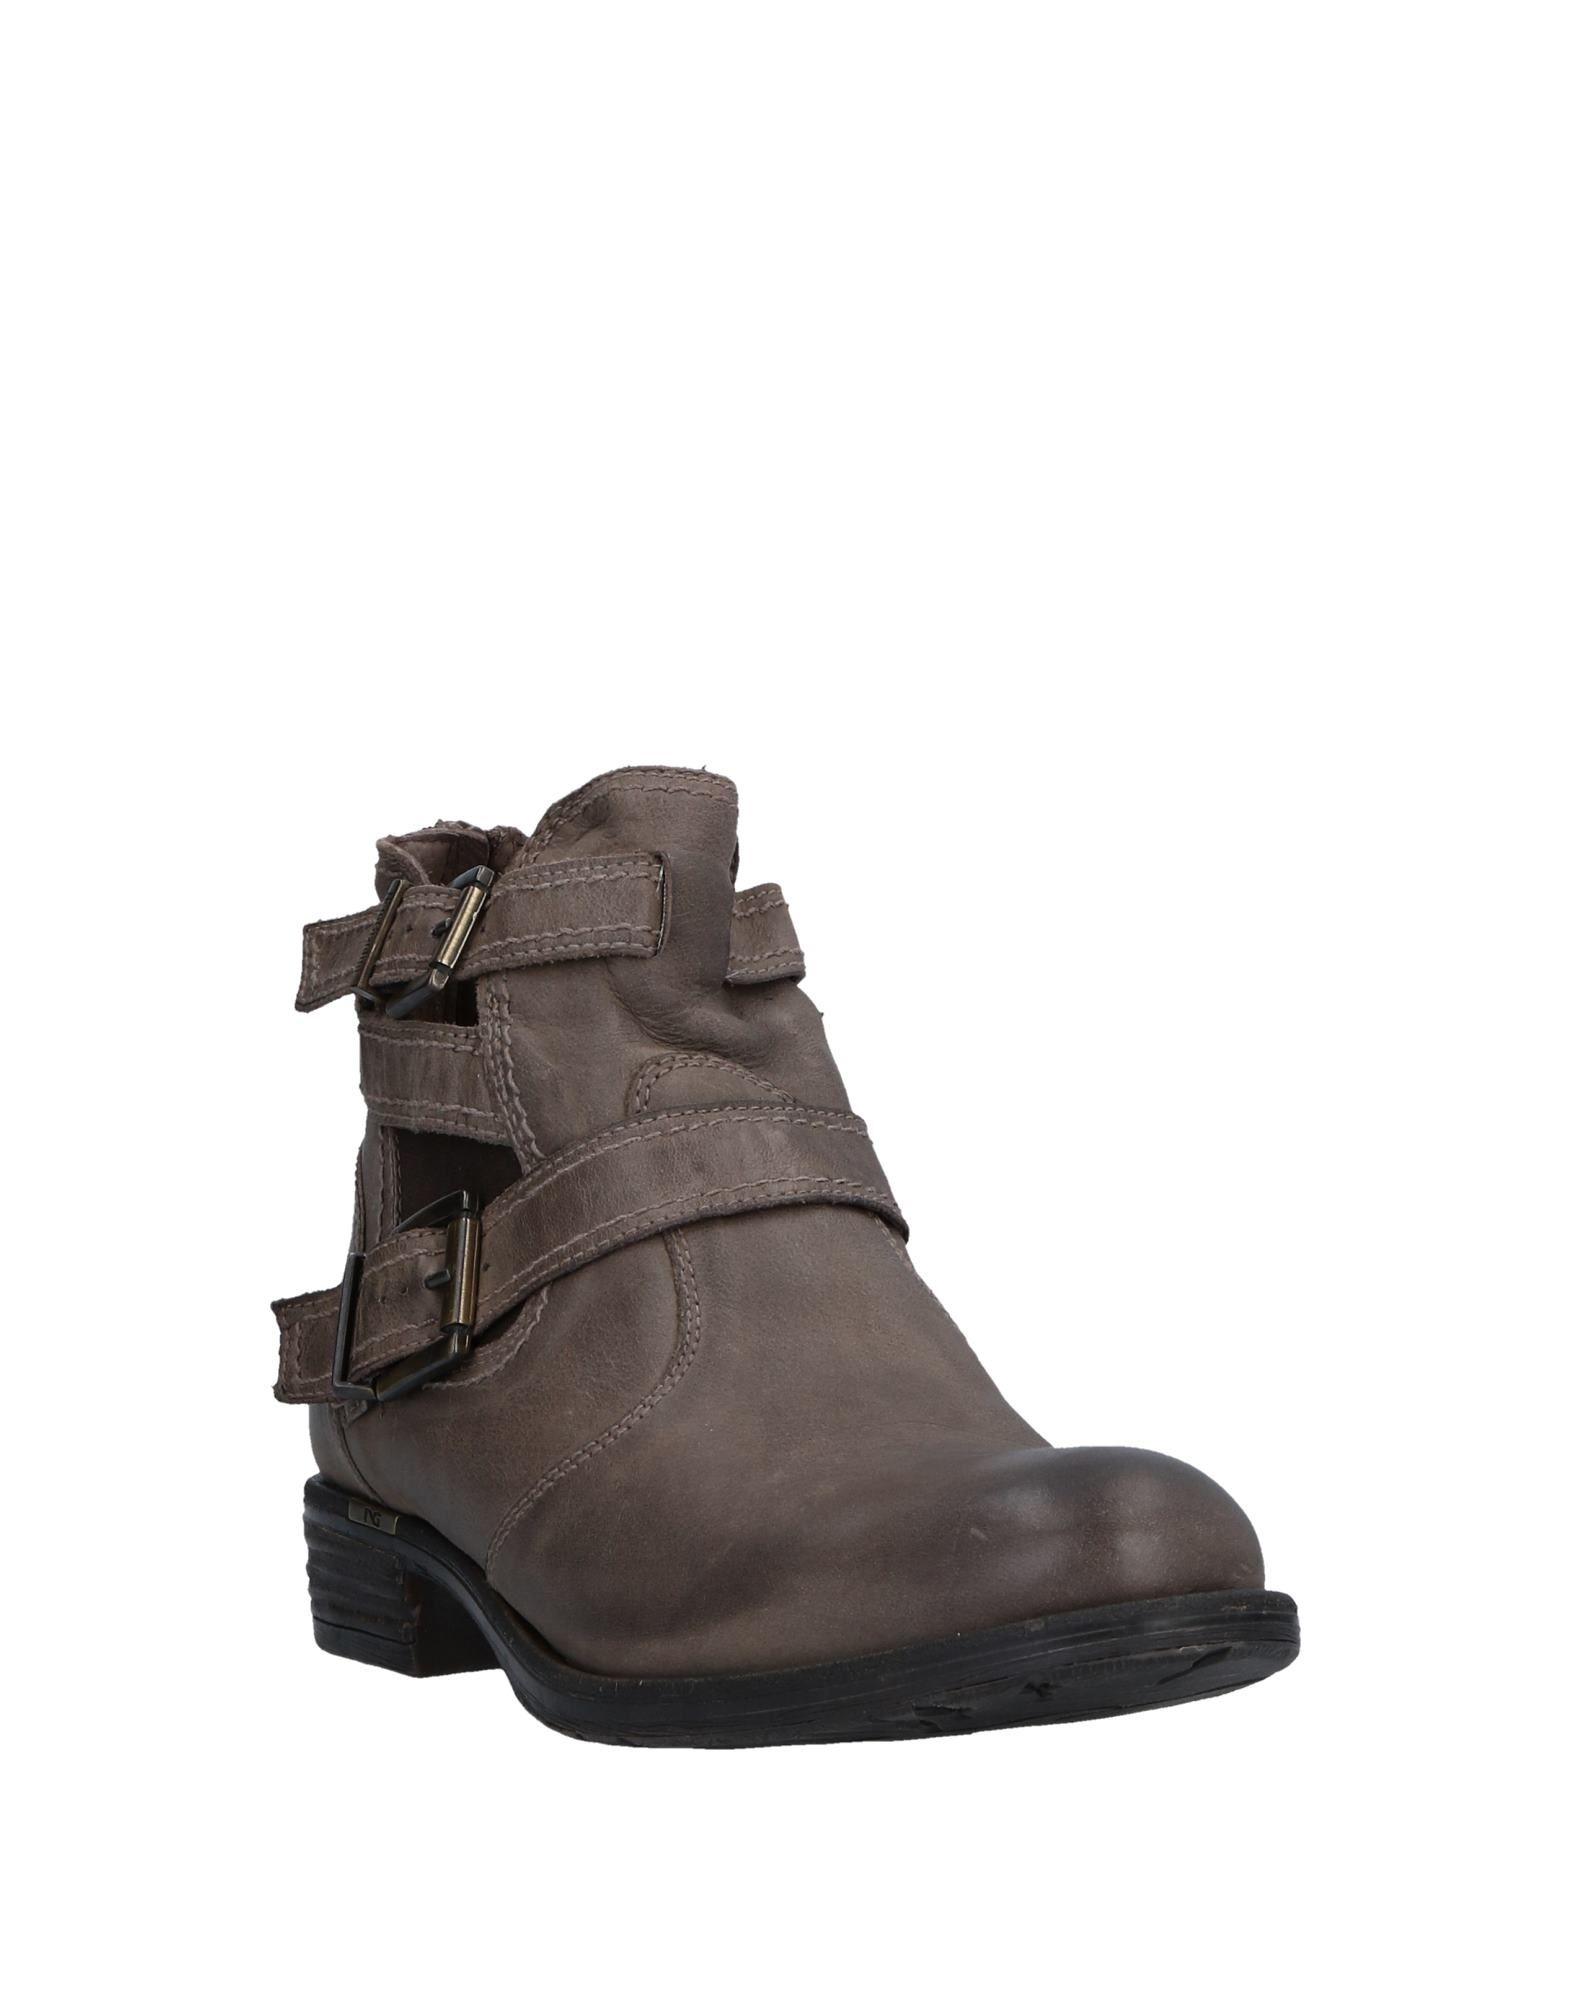 Nero Giardini Ankle Boot - - - Women Nero Giardini Ankle Boots online on  United Kingdom - 11249925PQ 73743b